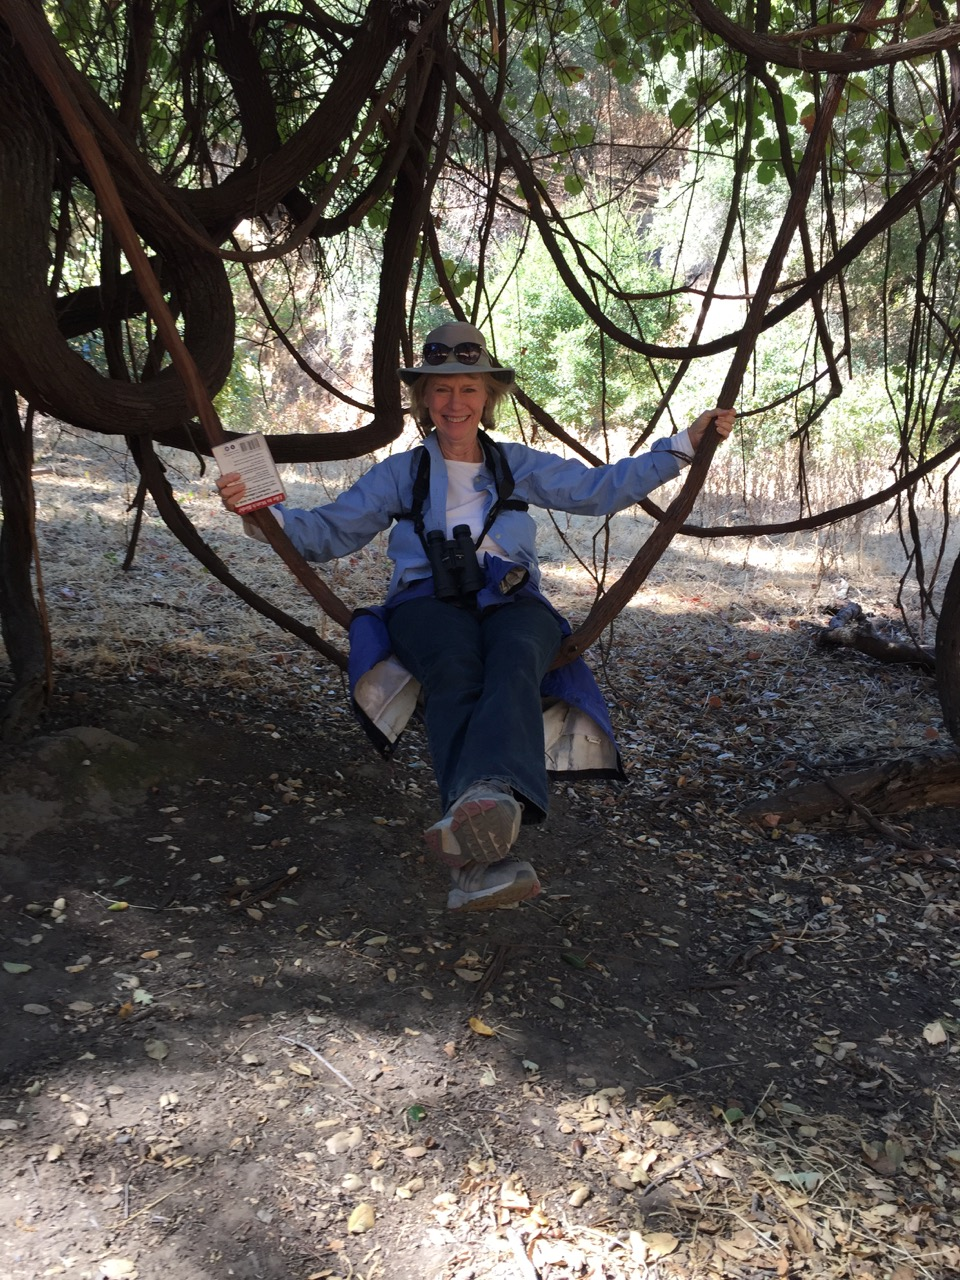 Grapevine Swing